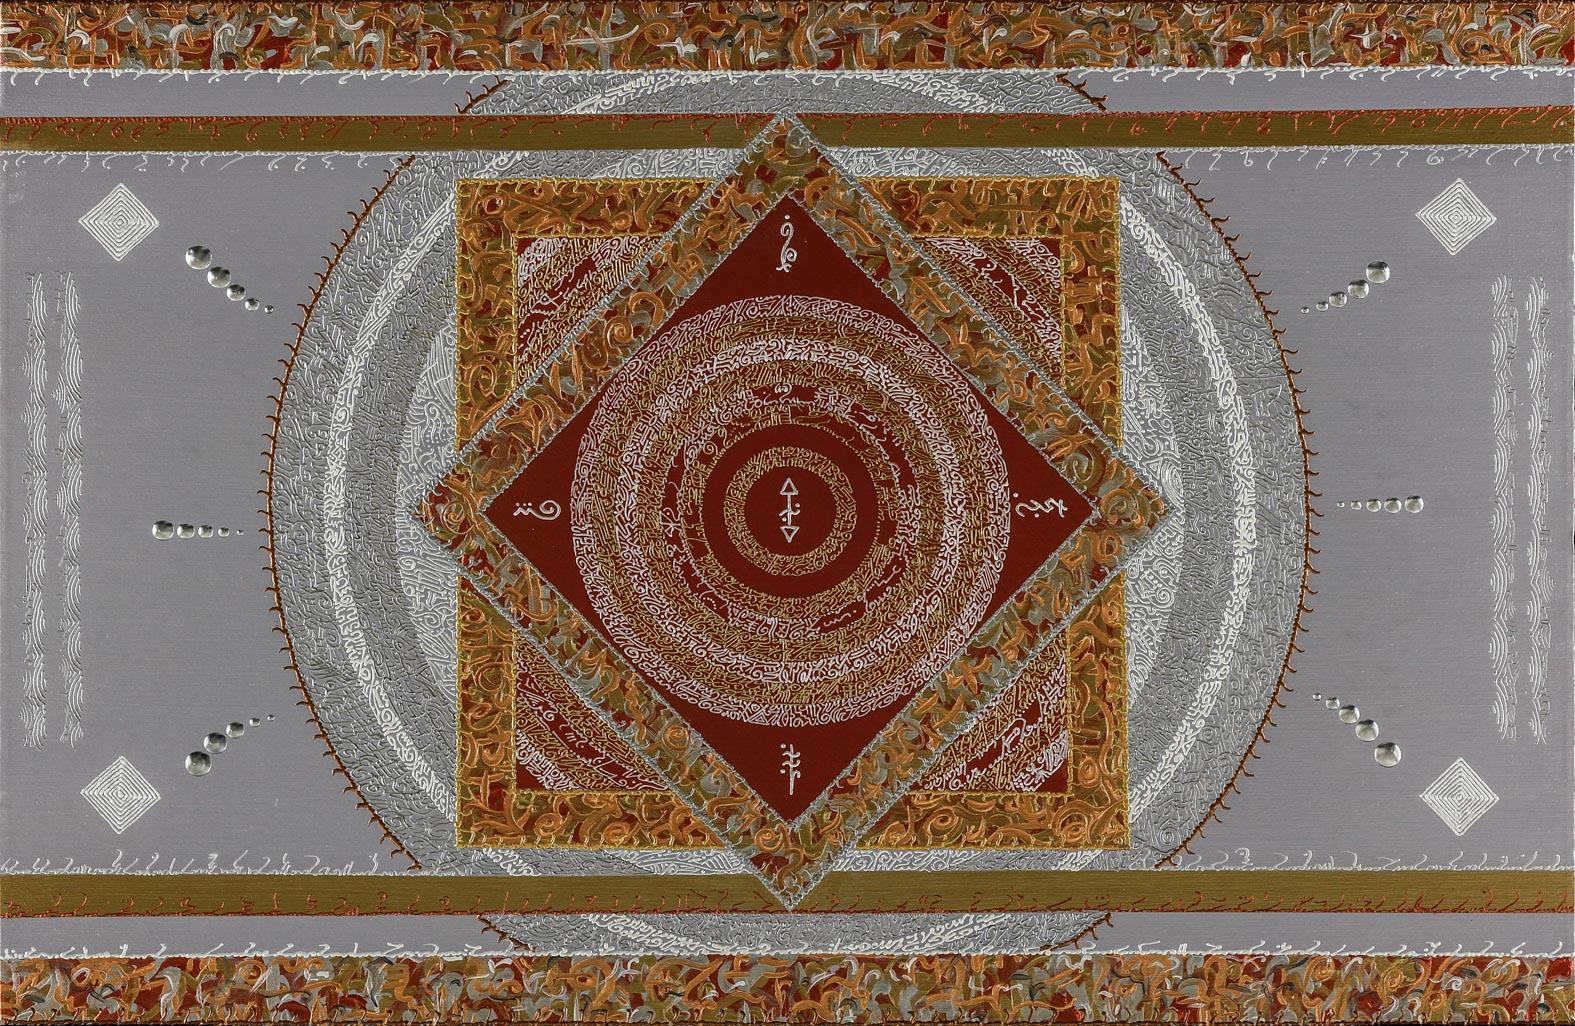 1_Cosmic_Chakra_Side_Image